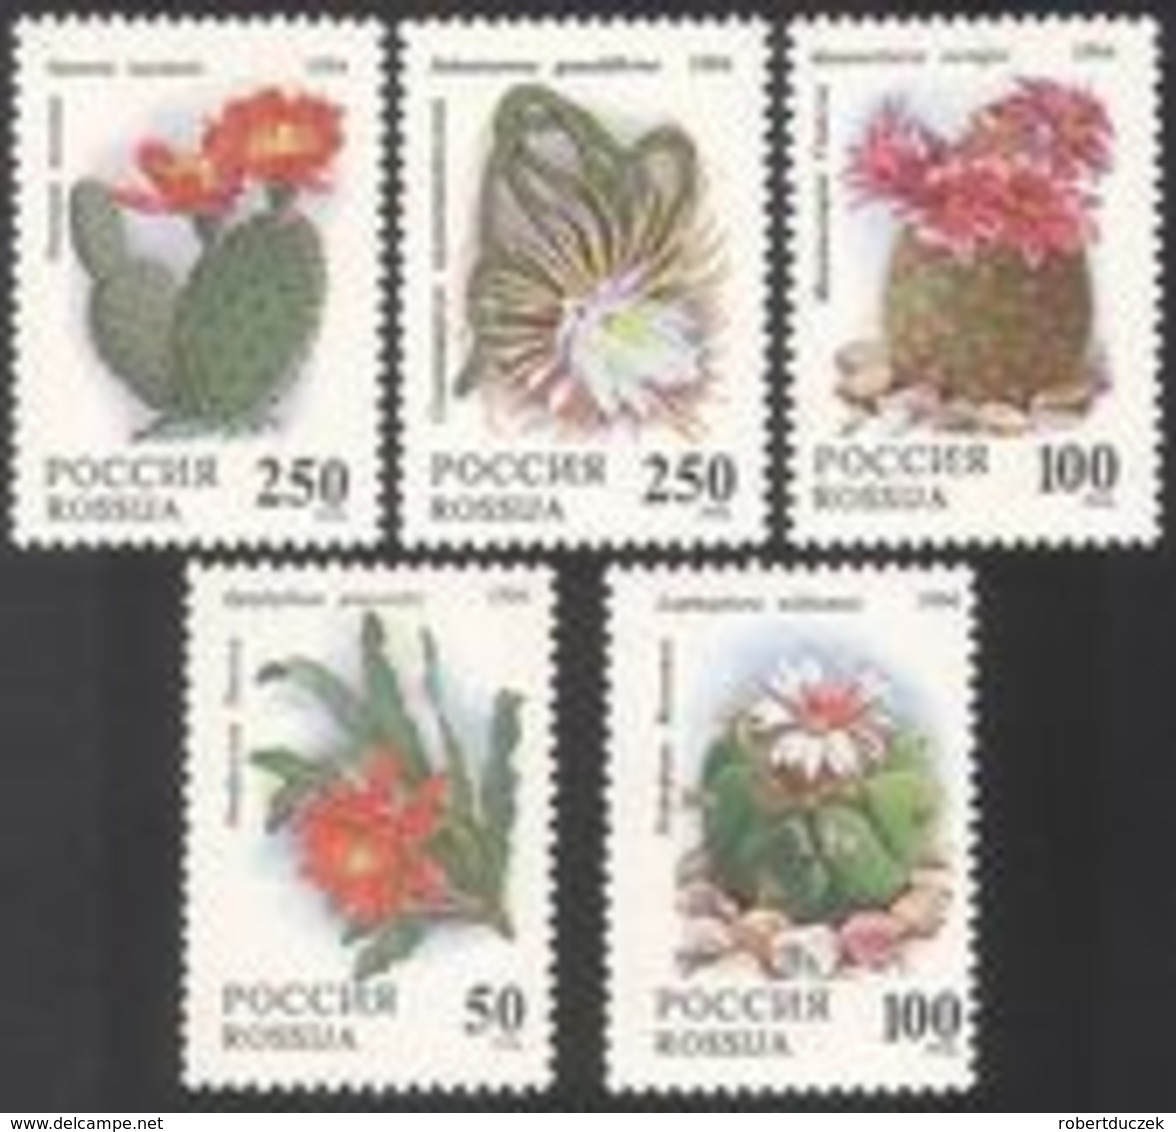 Russia. Rossija. 1994 Cactuses. Flora. Flowers. Mi 363-67. MNH** - Nuevos